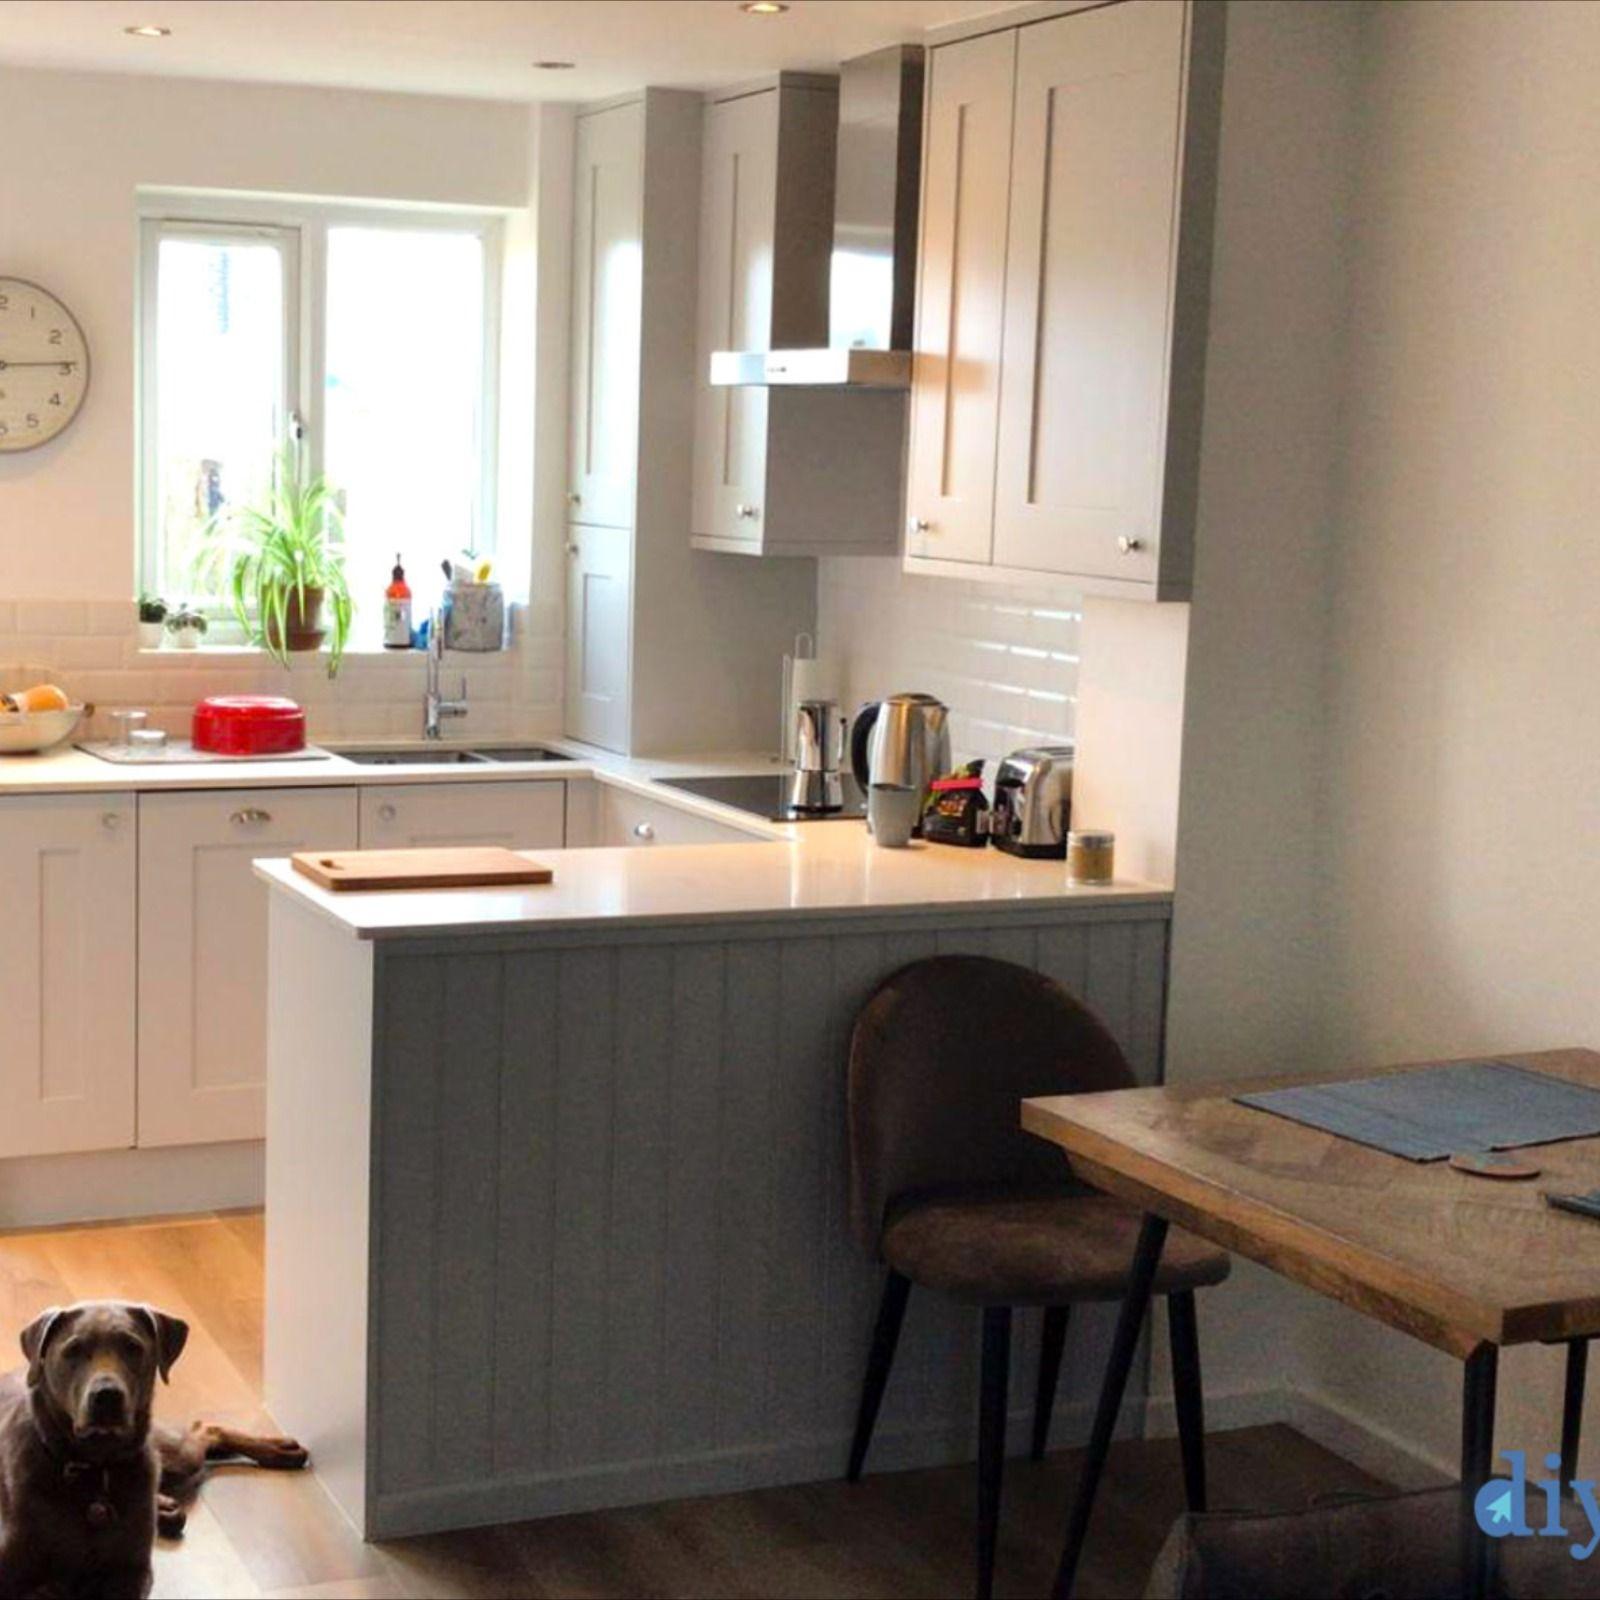 Best An Innova Stanbury Dove Grey Shaker Kitchen In 2020 Grey 400 x 300